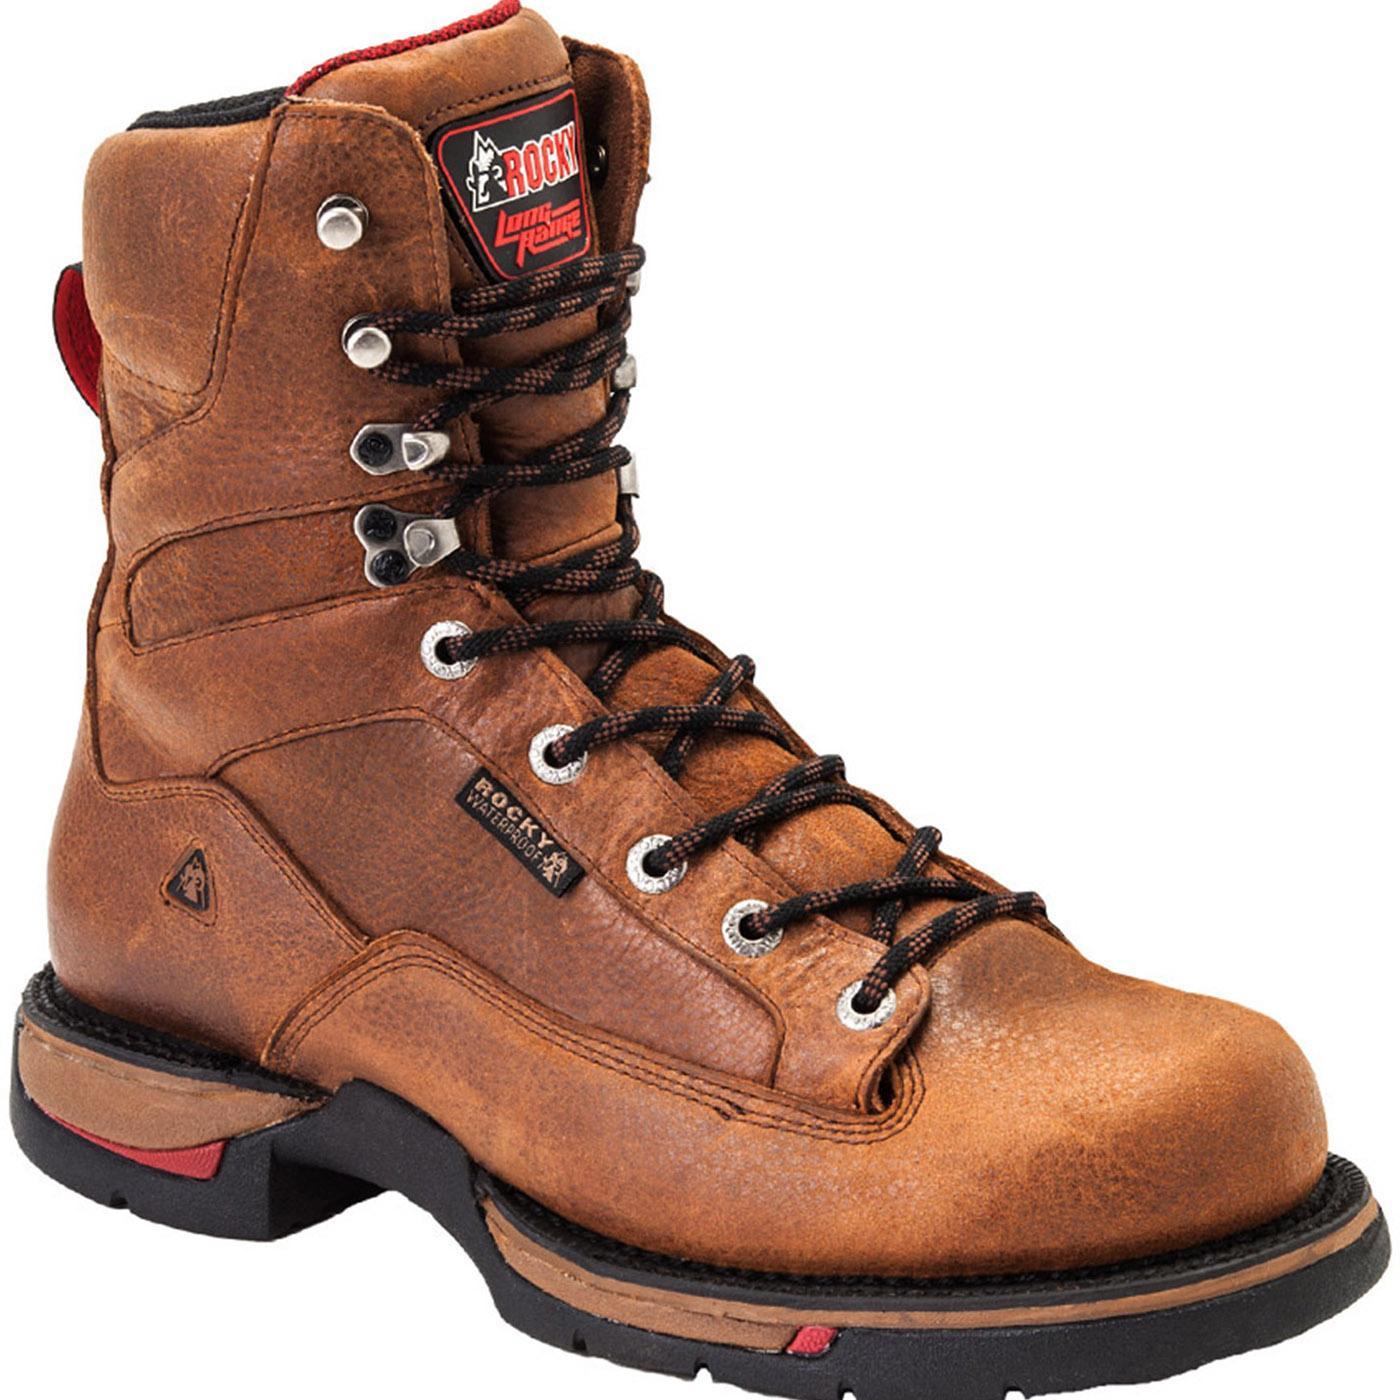 47db1ddb5ff Rocky Long Range Aluminum Toe Waterproof Work Boot